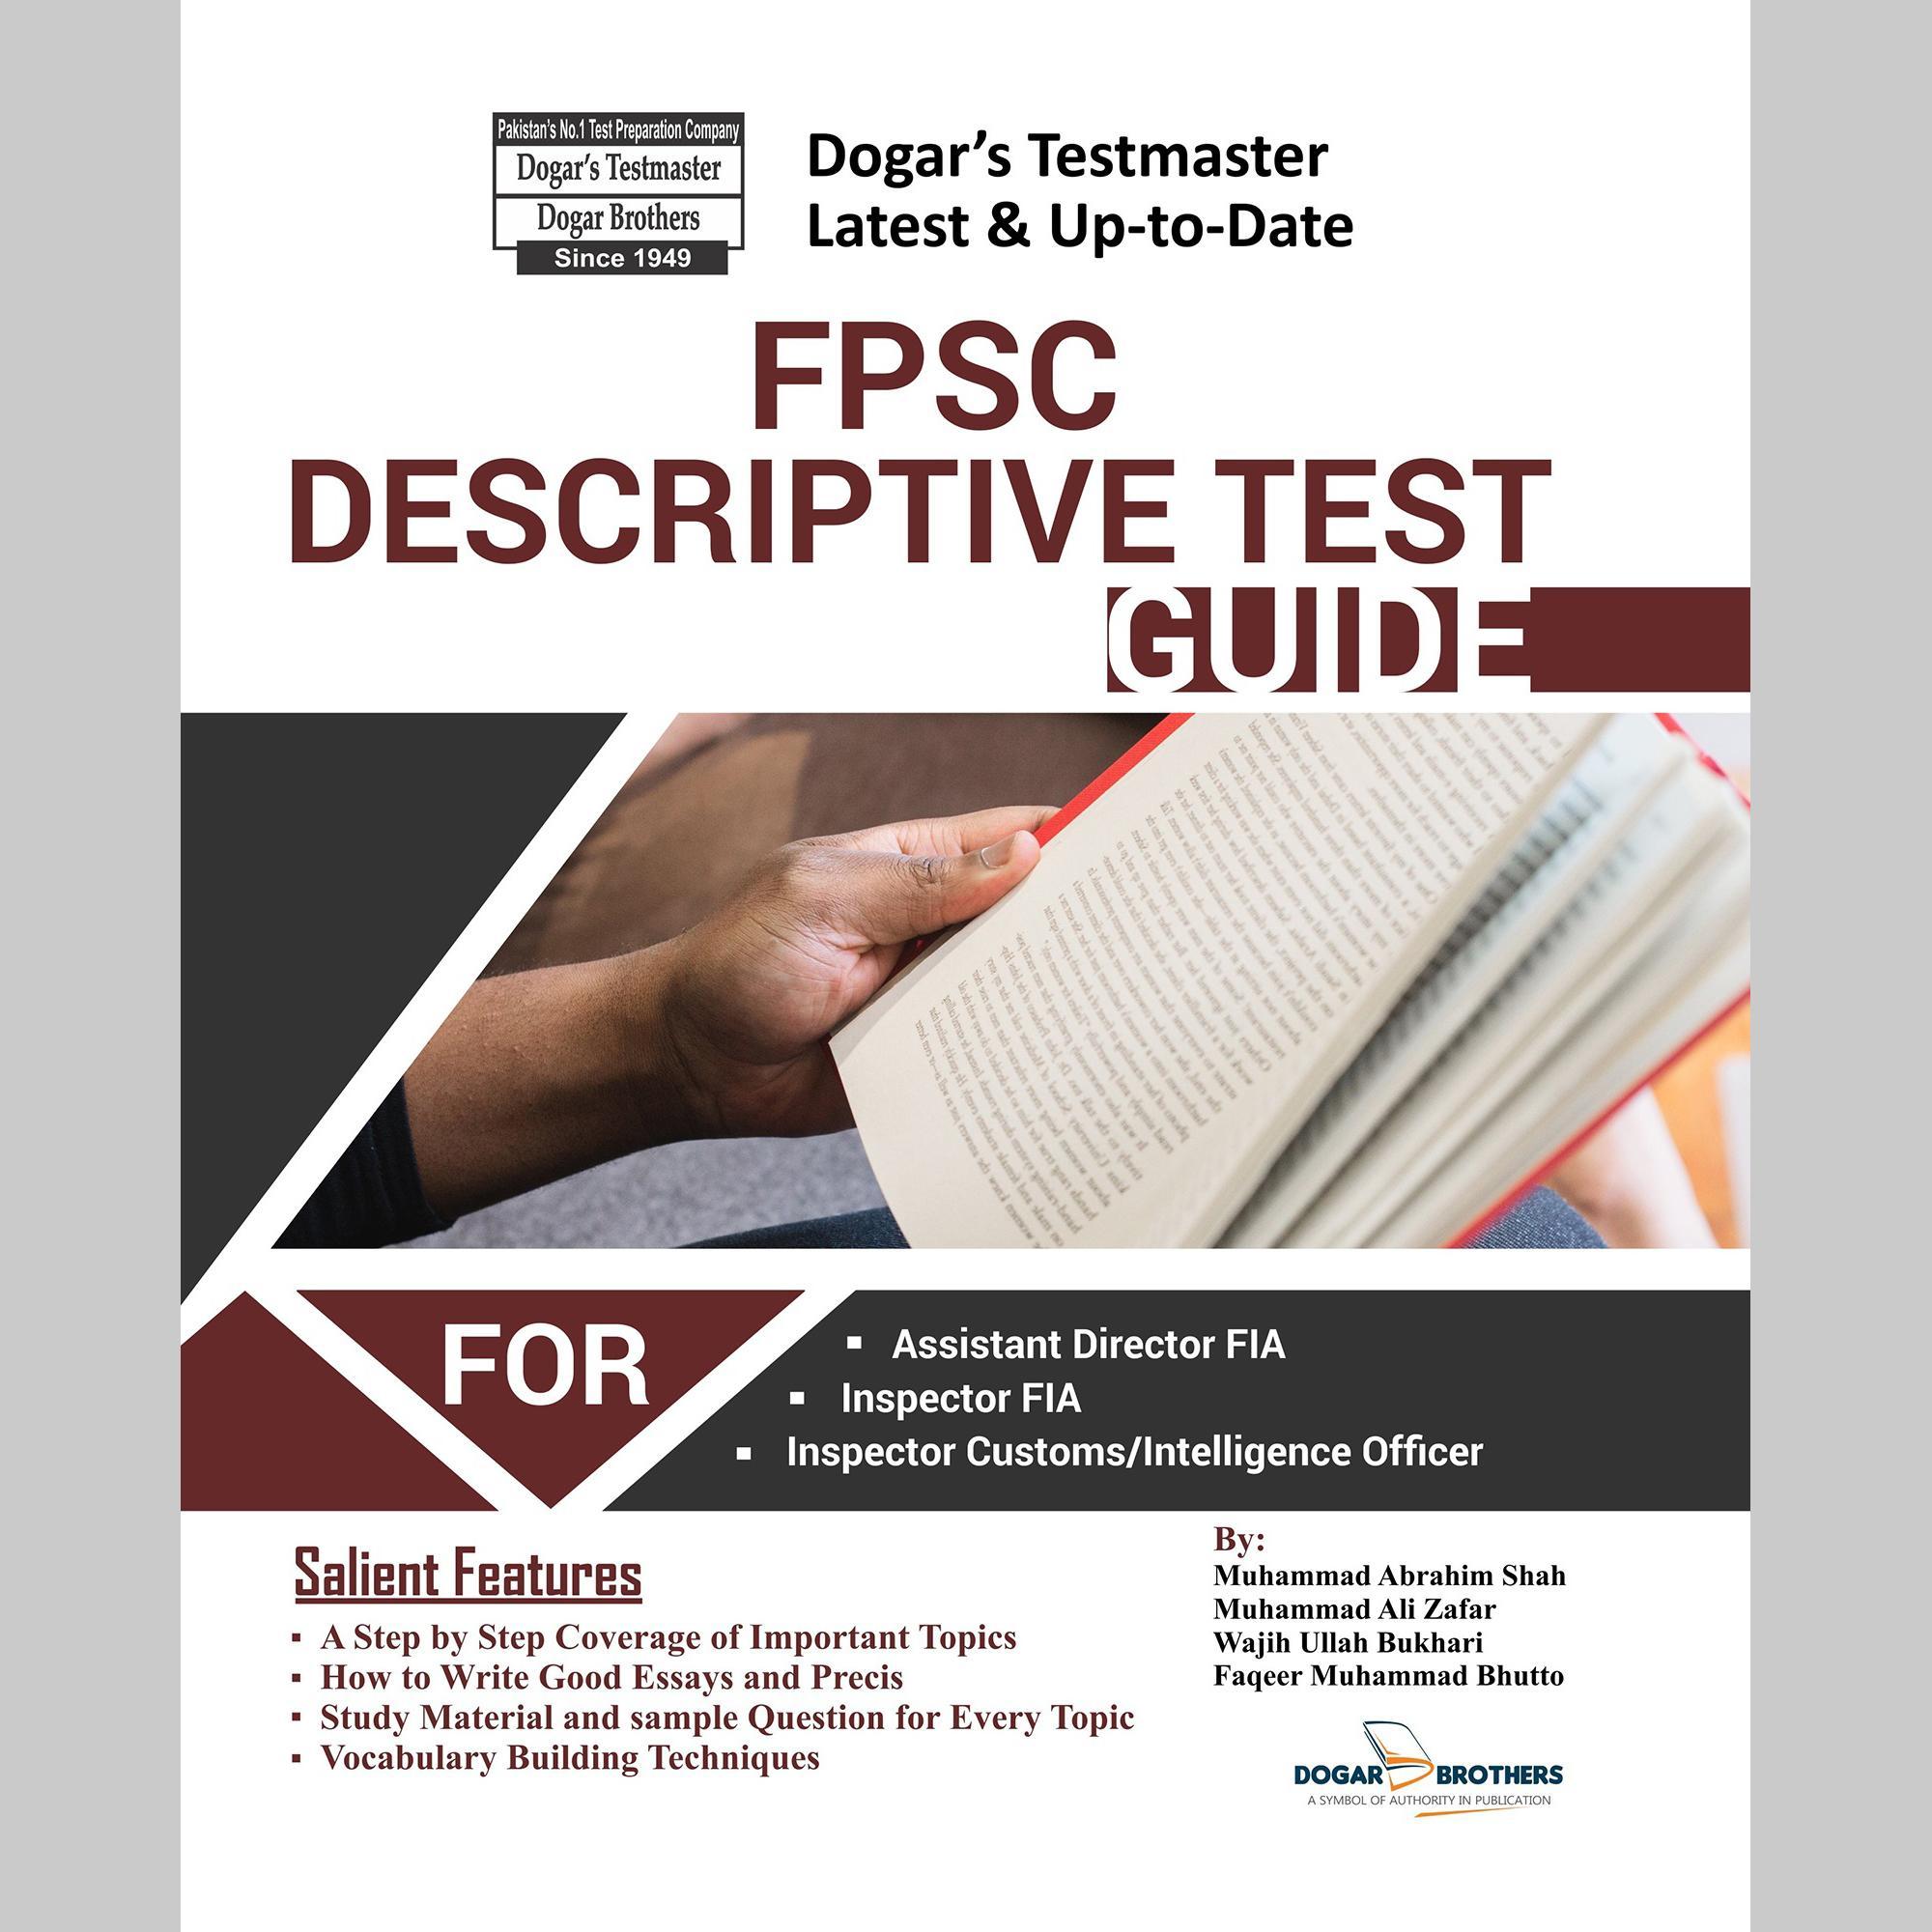 FPSC Descriptive Test Guide For Assistant Director FIA / Inspector FIA /  Custom Inspector / Intelligence Officer by Dogar's Testmaster 2019